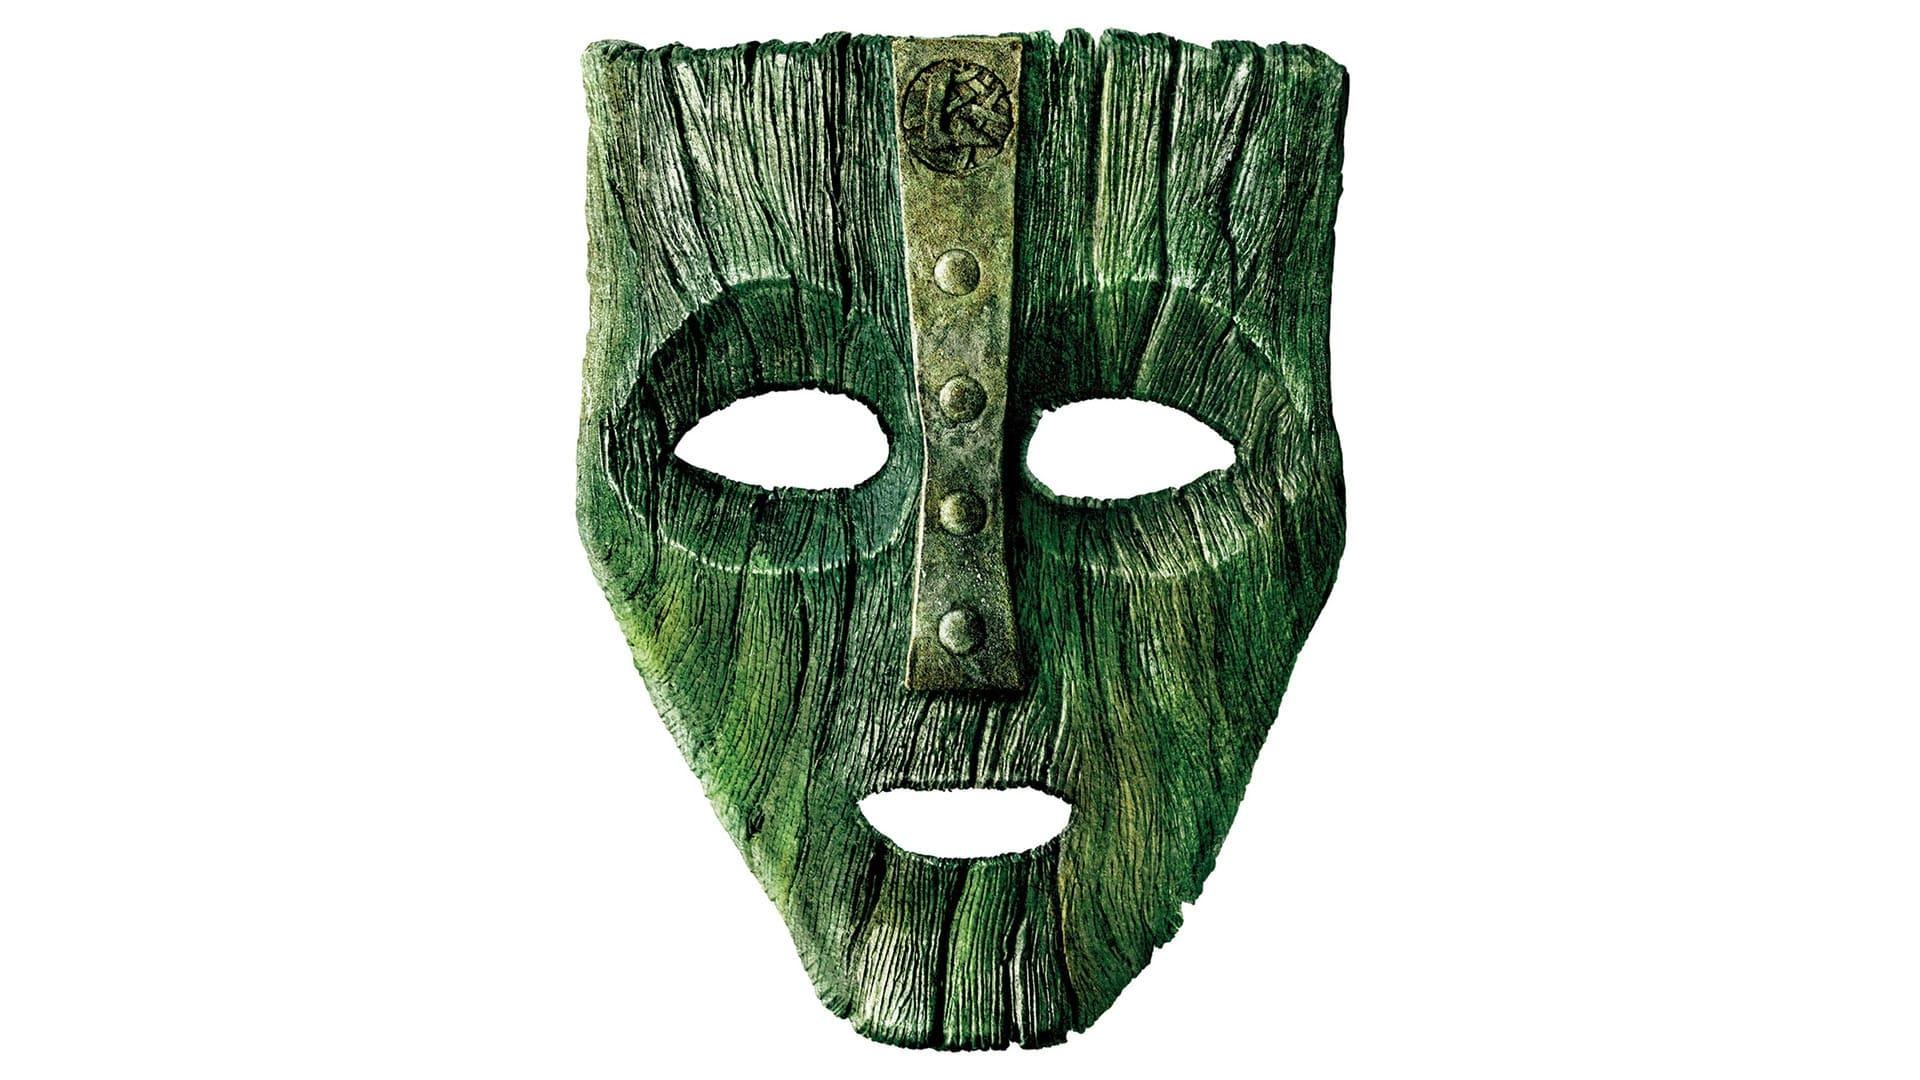 Contraportada The Mask